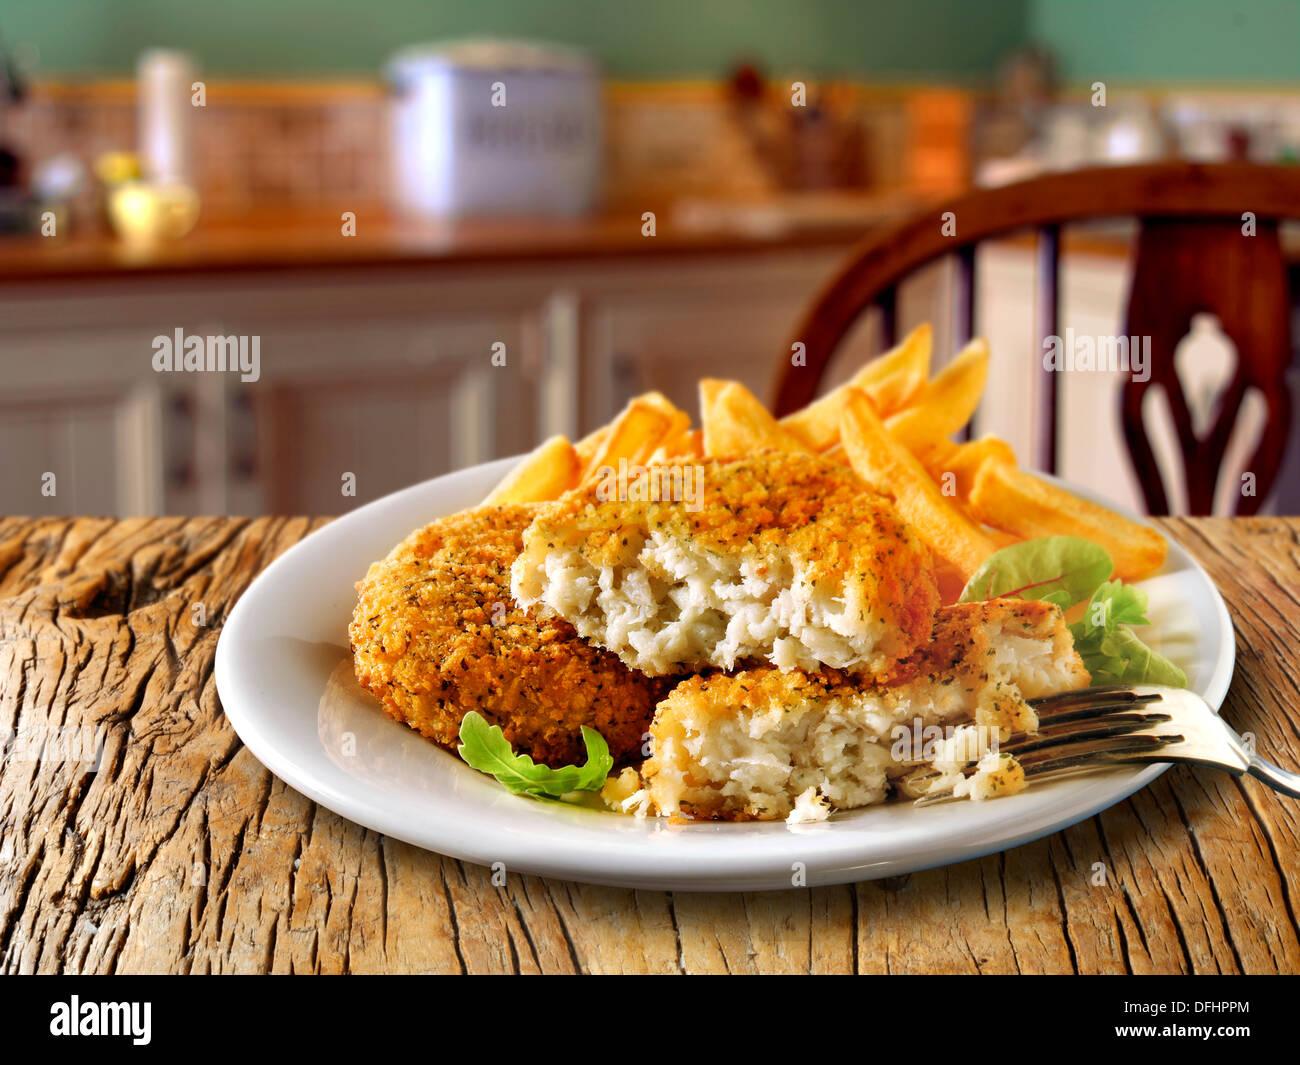 Comida Británica - pastel de pescado empanizado & Chips Imagen De Stock